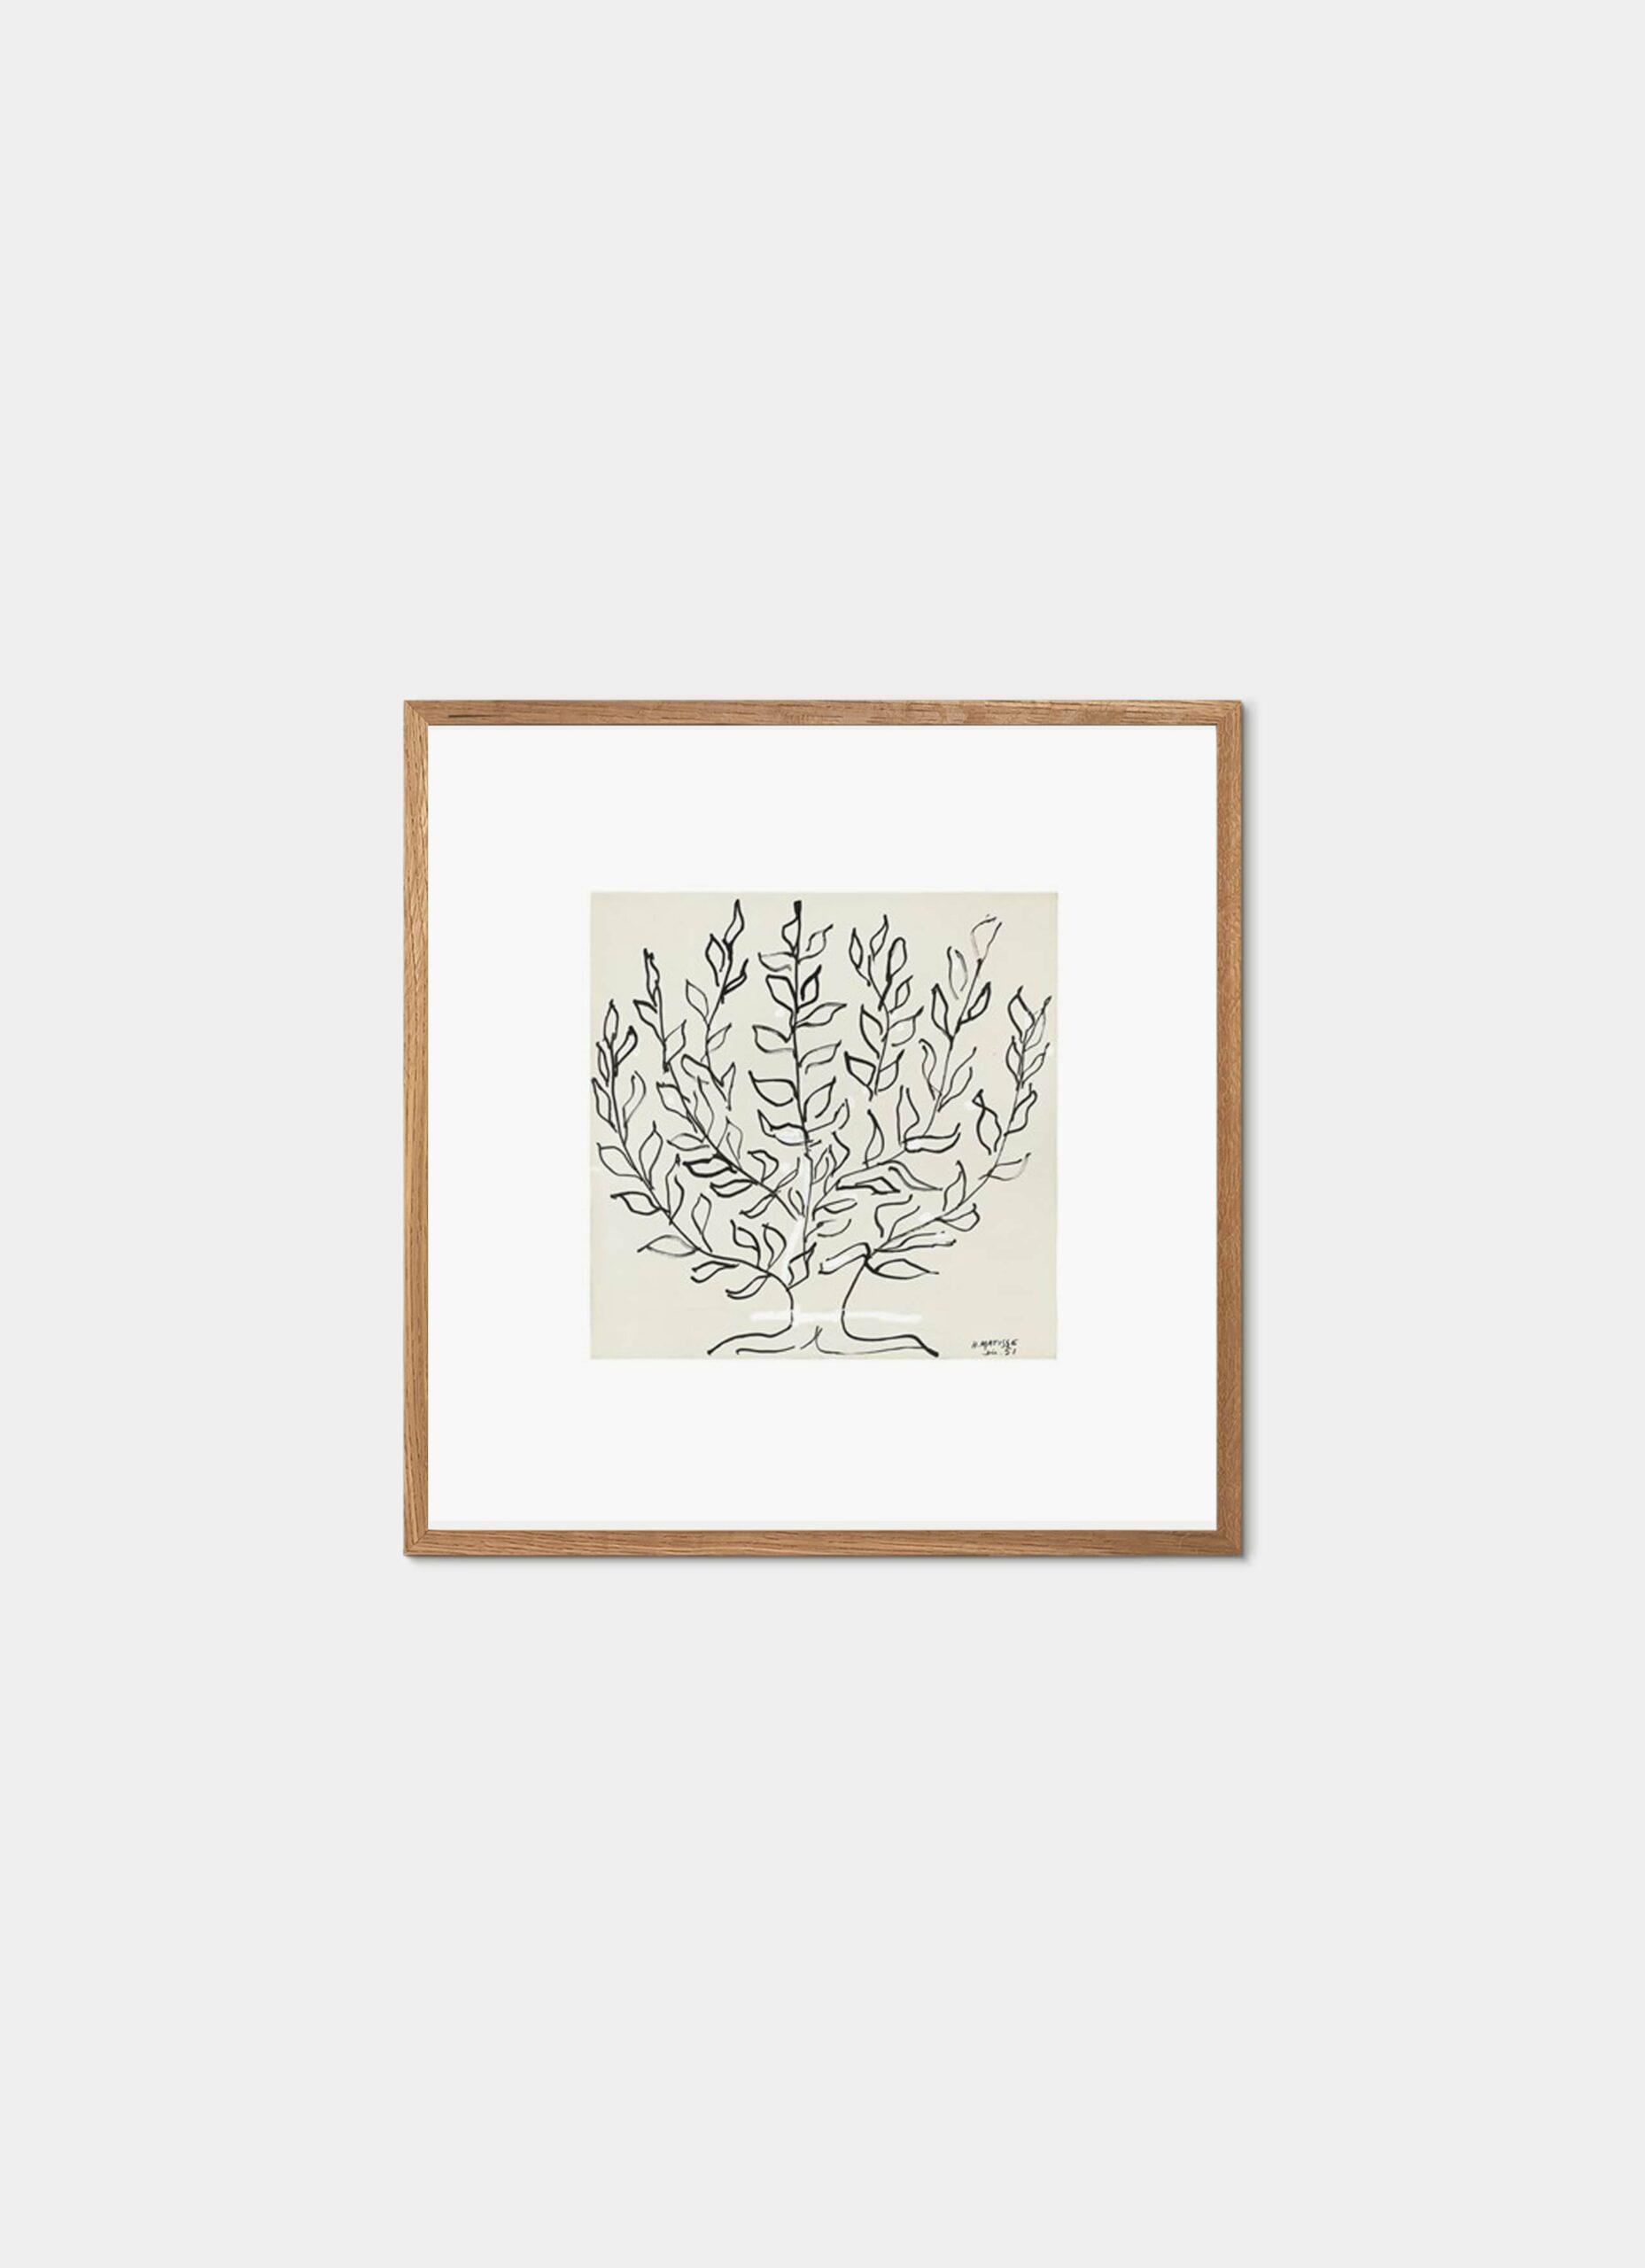 Matisse - Art Print - La Platane - 50x50cm